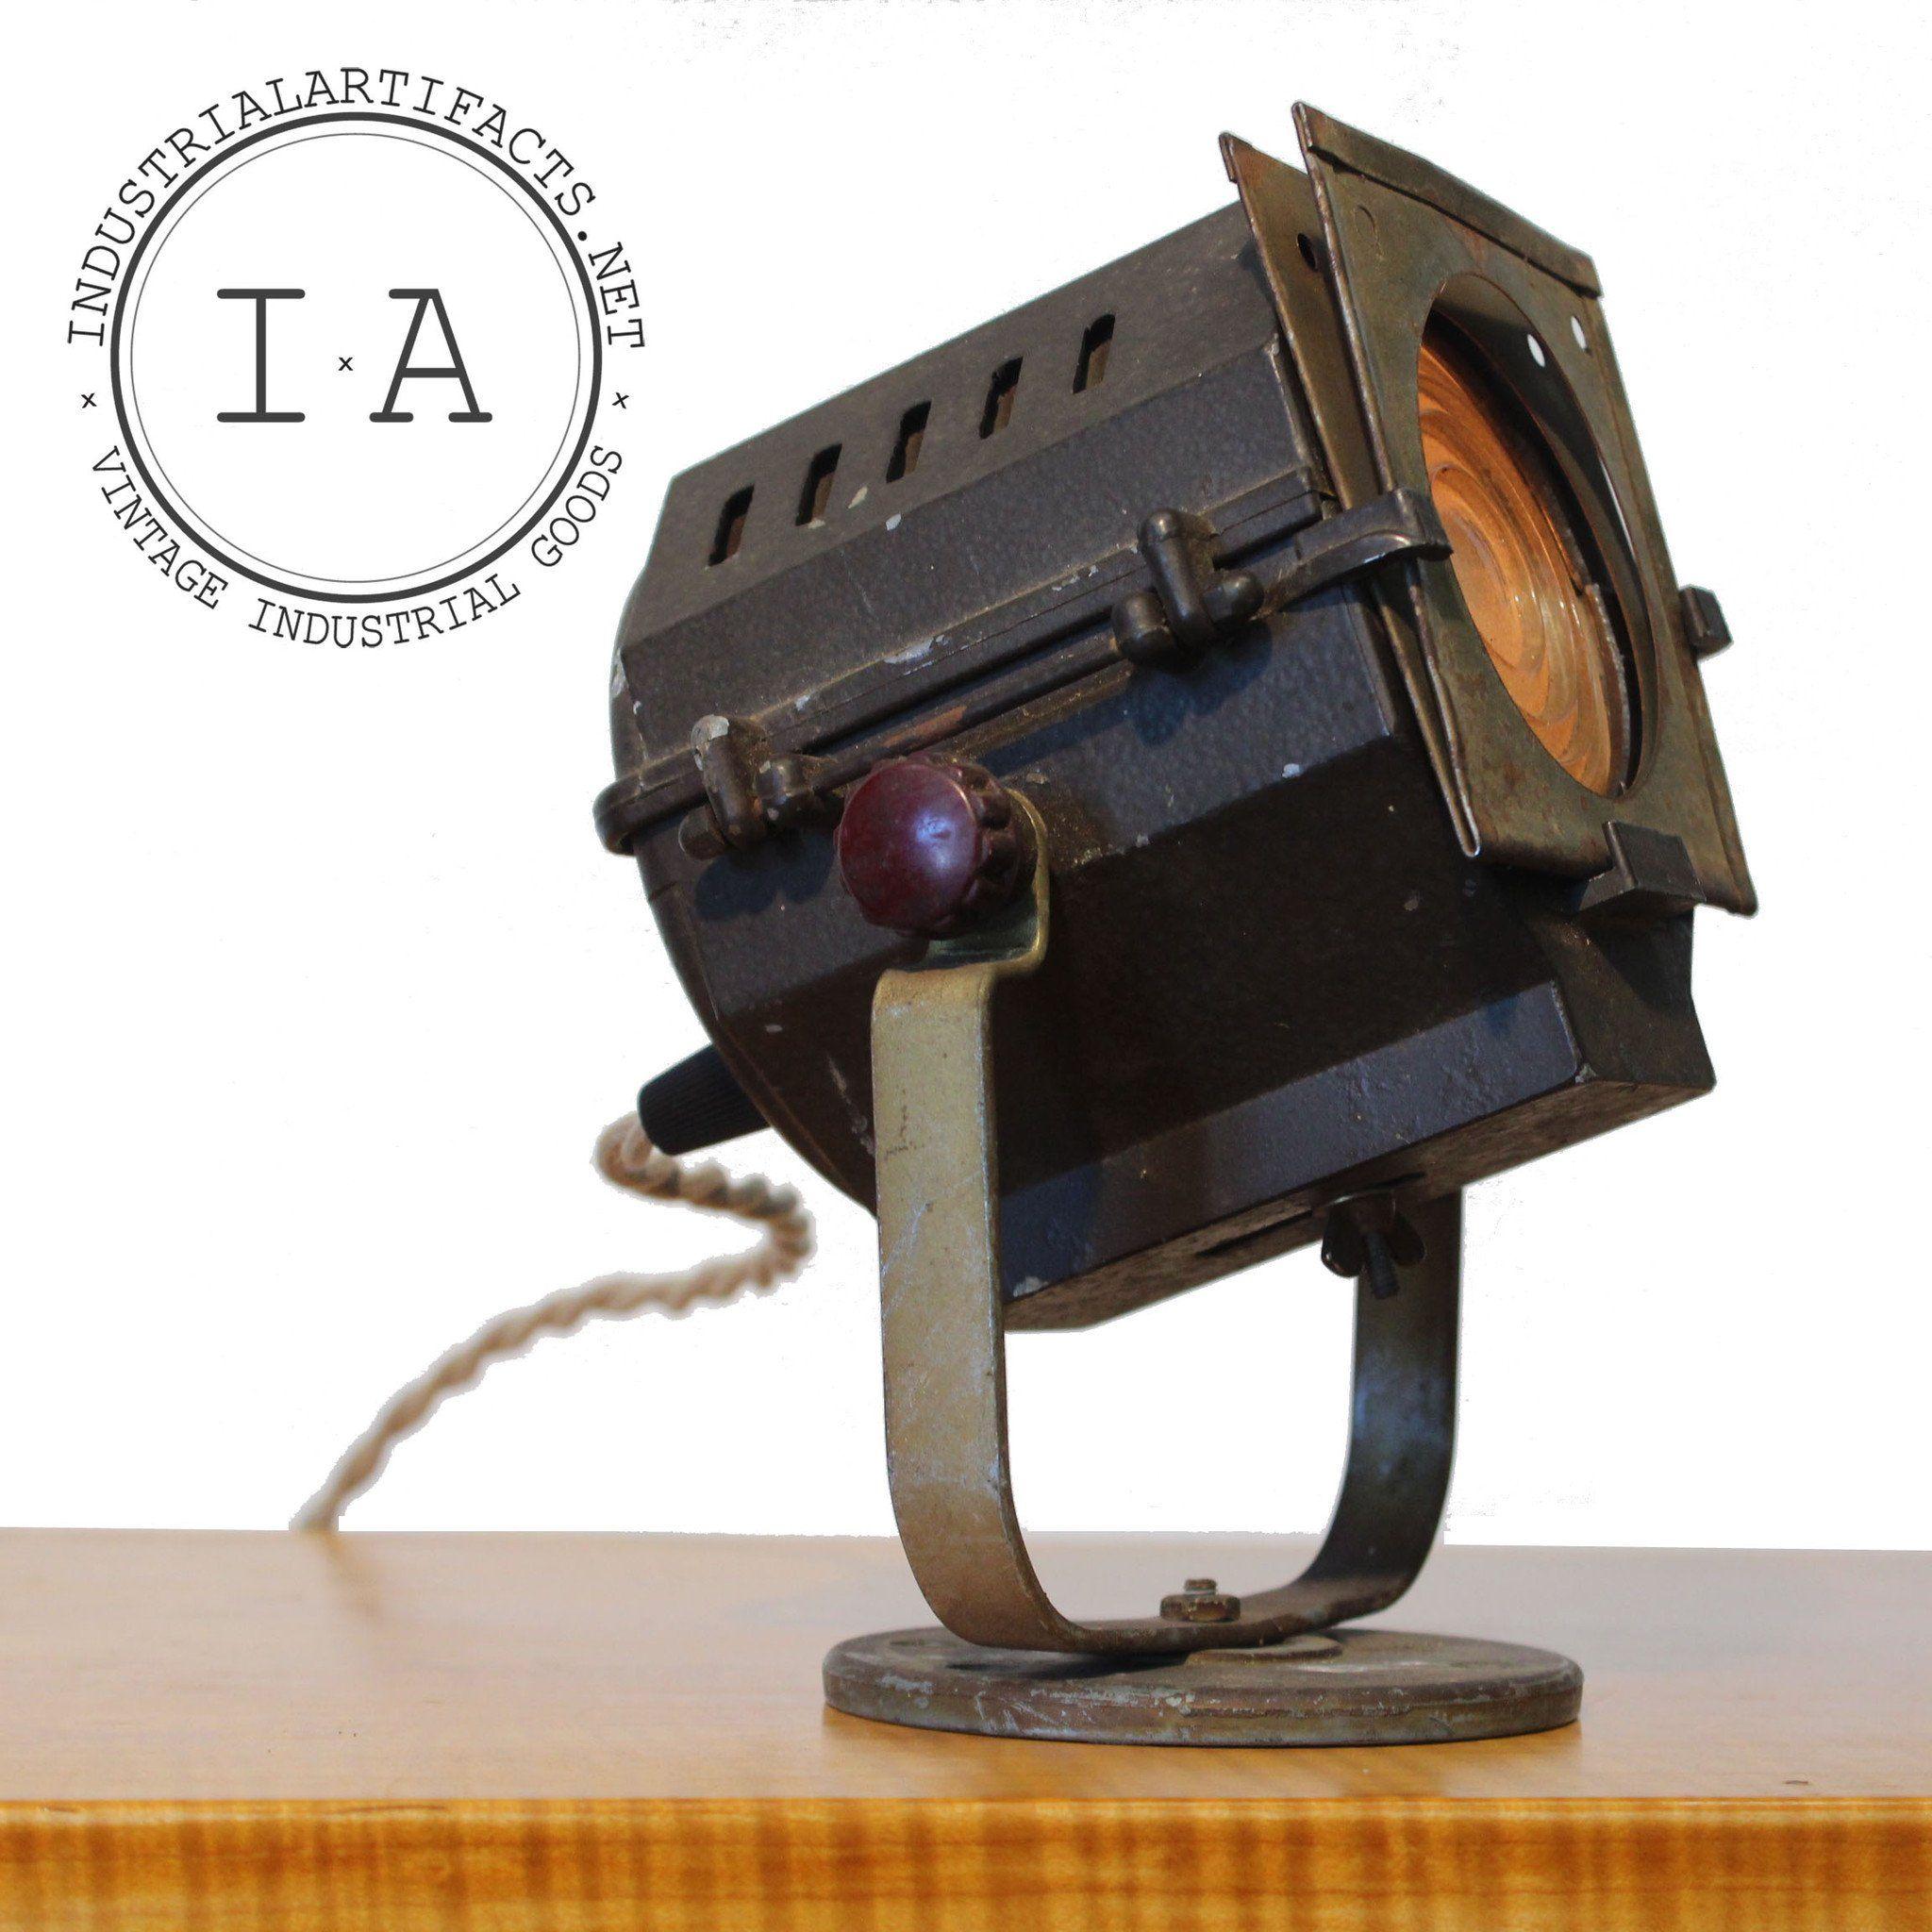 Small Decorative Spotlight: Vintage Industrial Movie Stage Photo Light Fresnel Lens